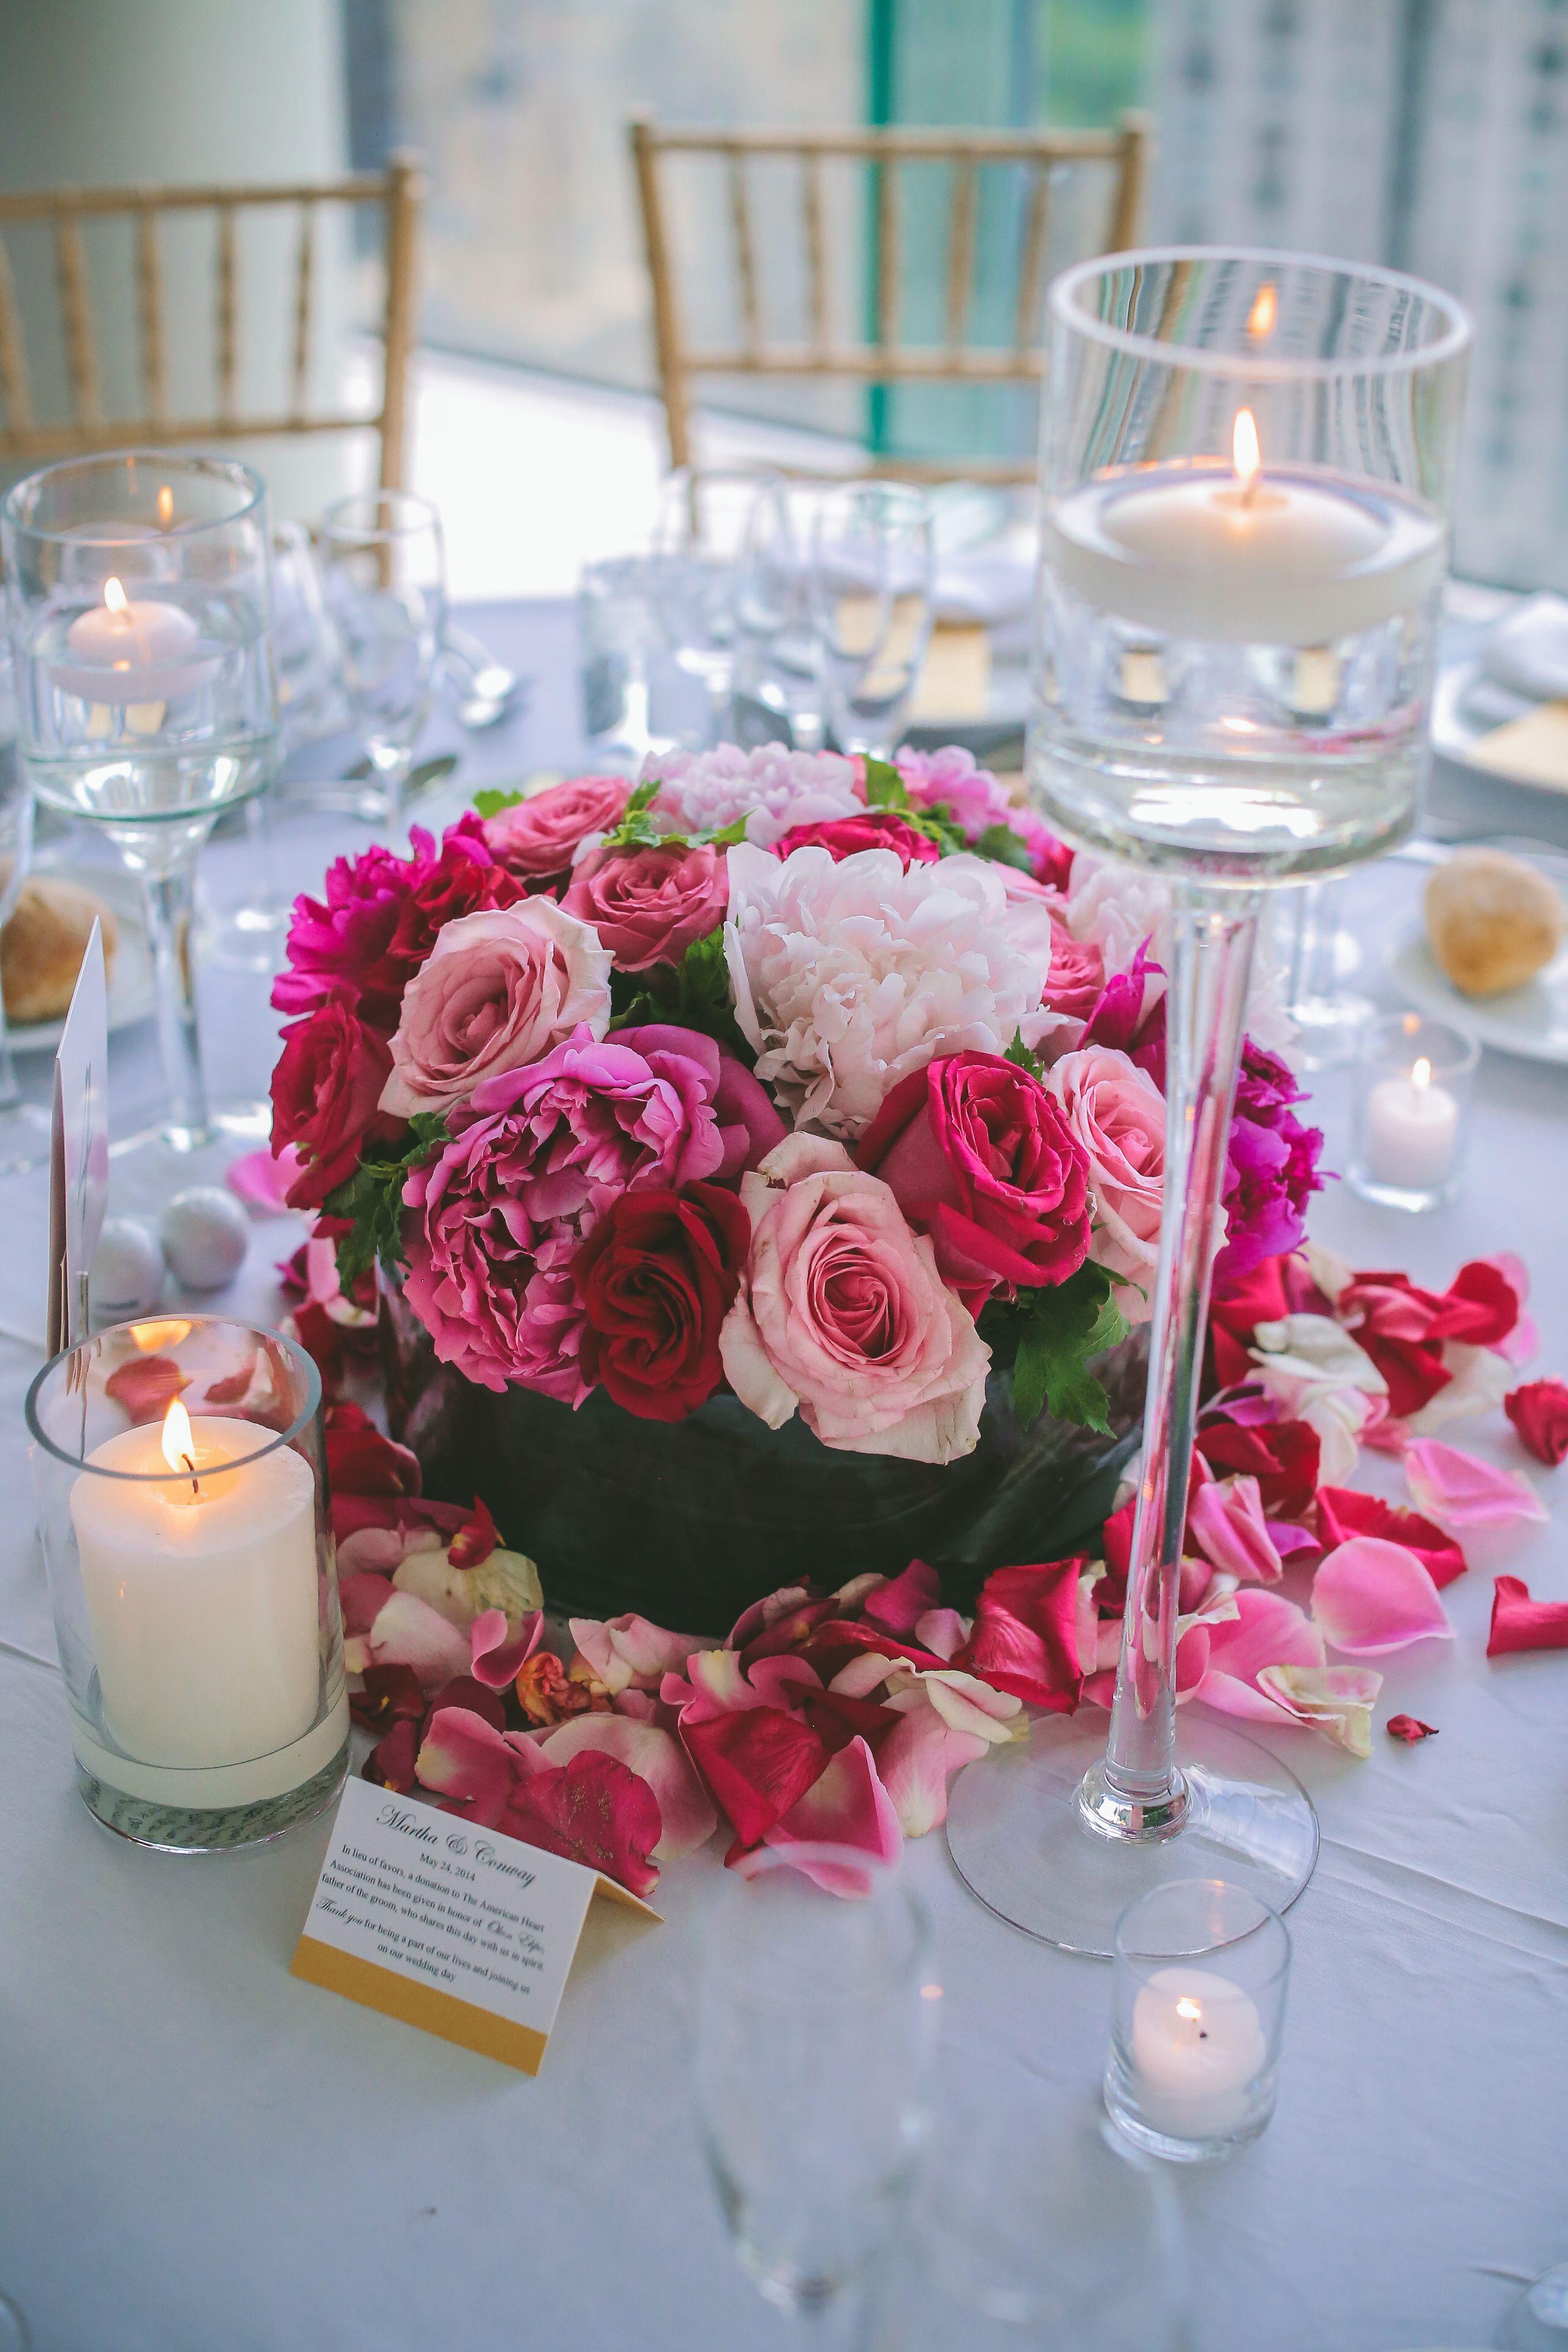 Romantic Candles And Pink Flower Arrangement Centerpiece Flowers